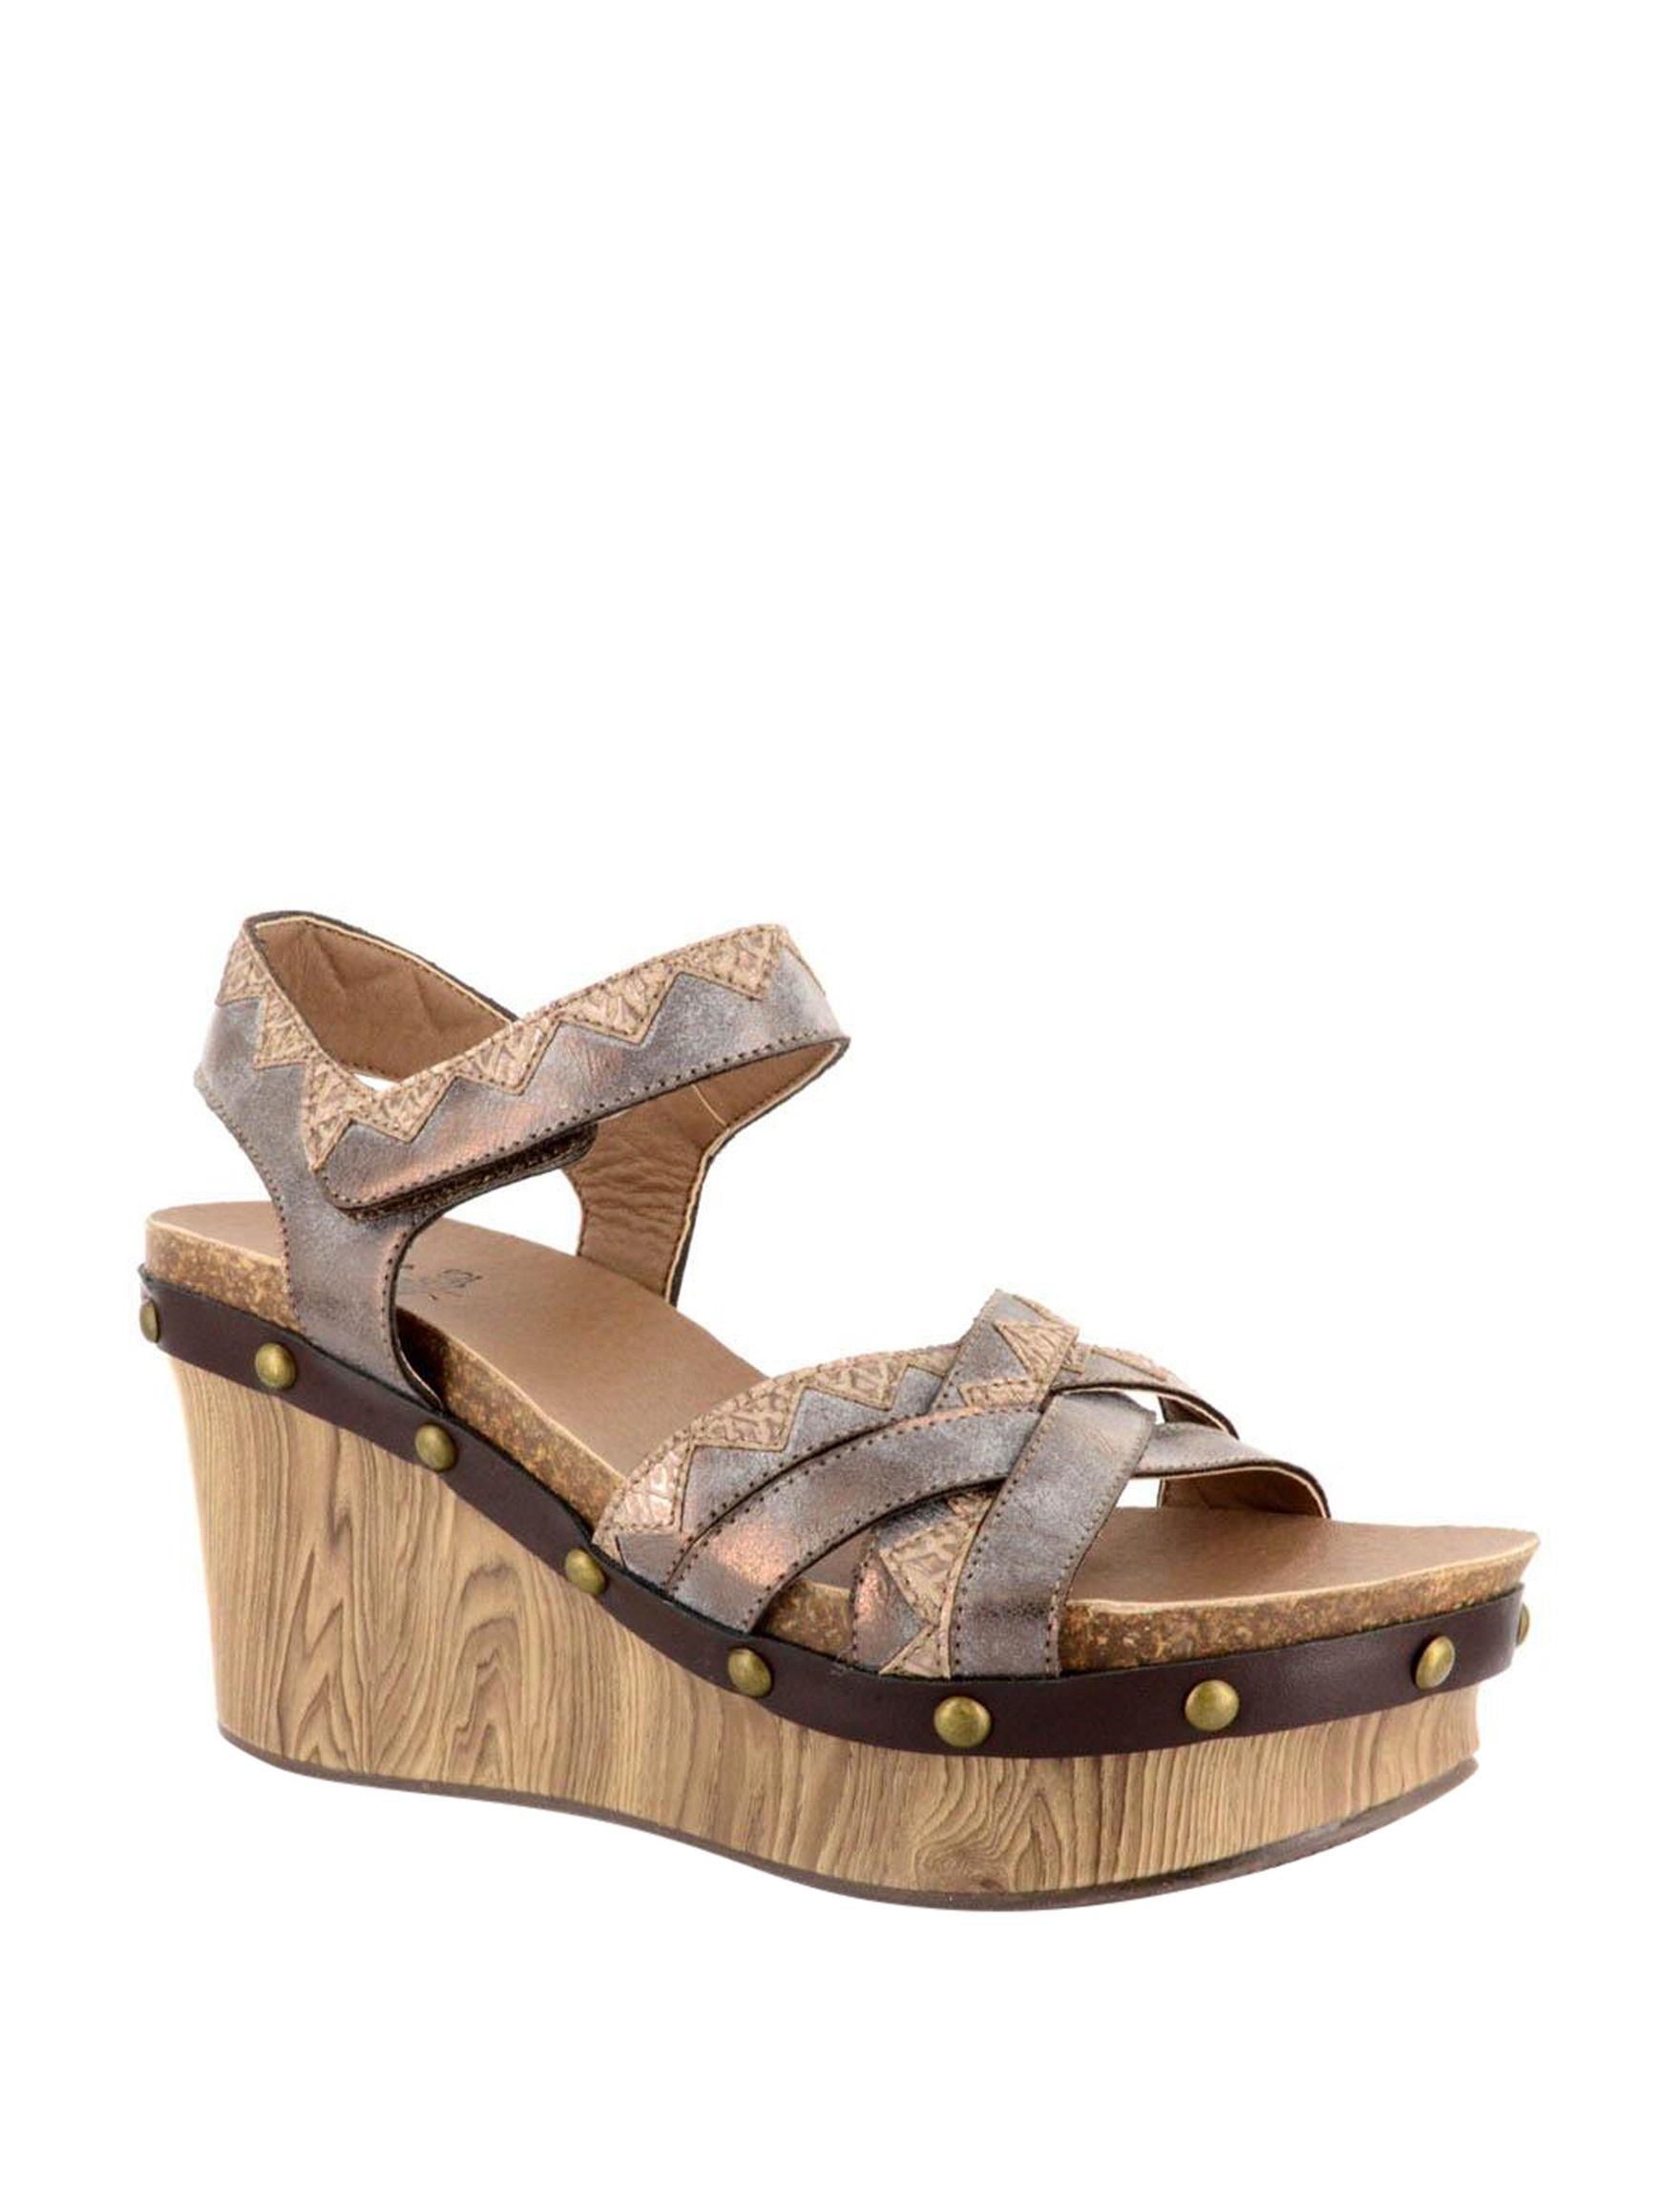 Corkys Bronze Platform Wedge Sandals